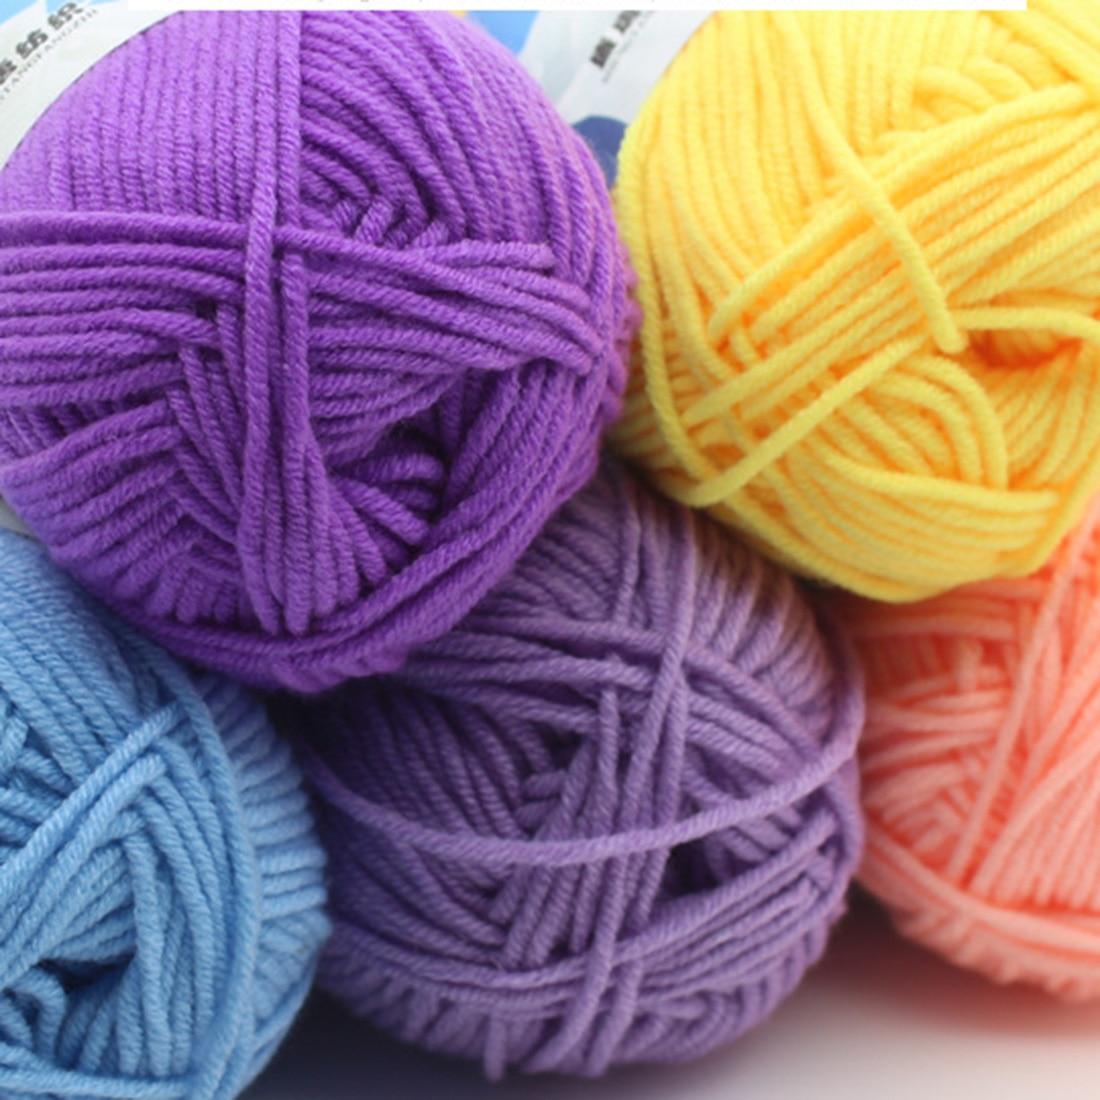 Sweet Soft Cotton Baby Knitting Wool Yarn Milk Cotton Thick Yarn for Knitting Scarf Hand Knitting Crochet Yarn 1